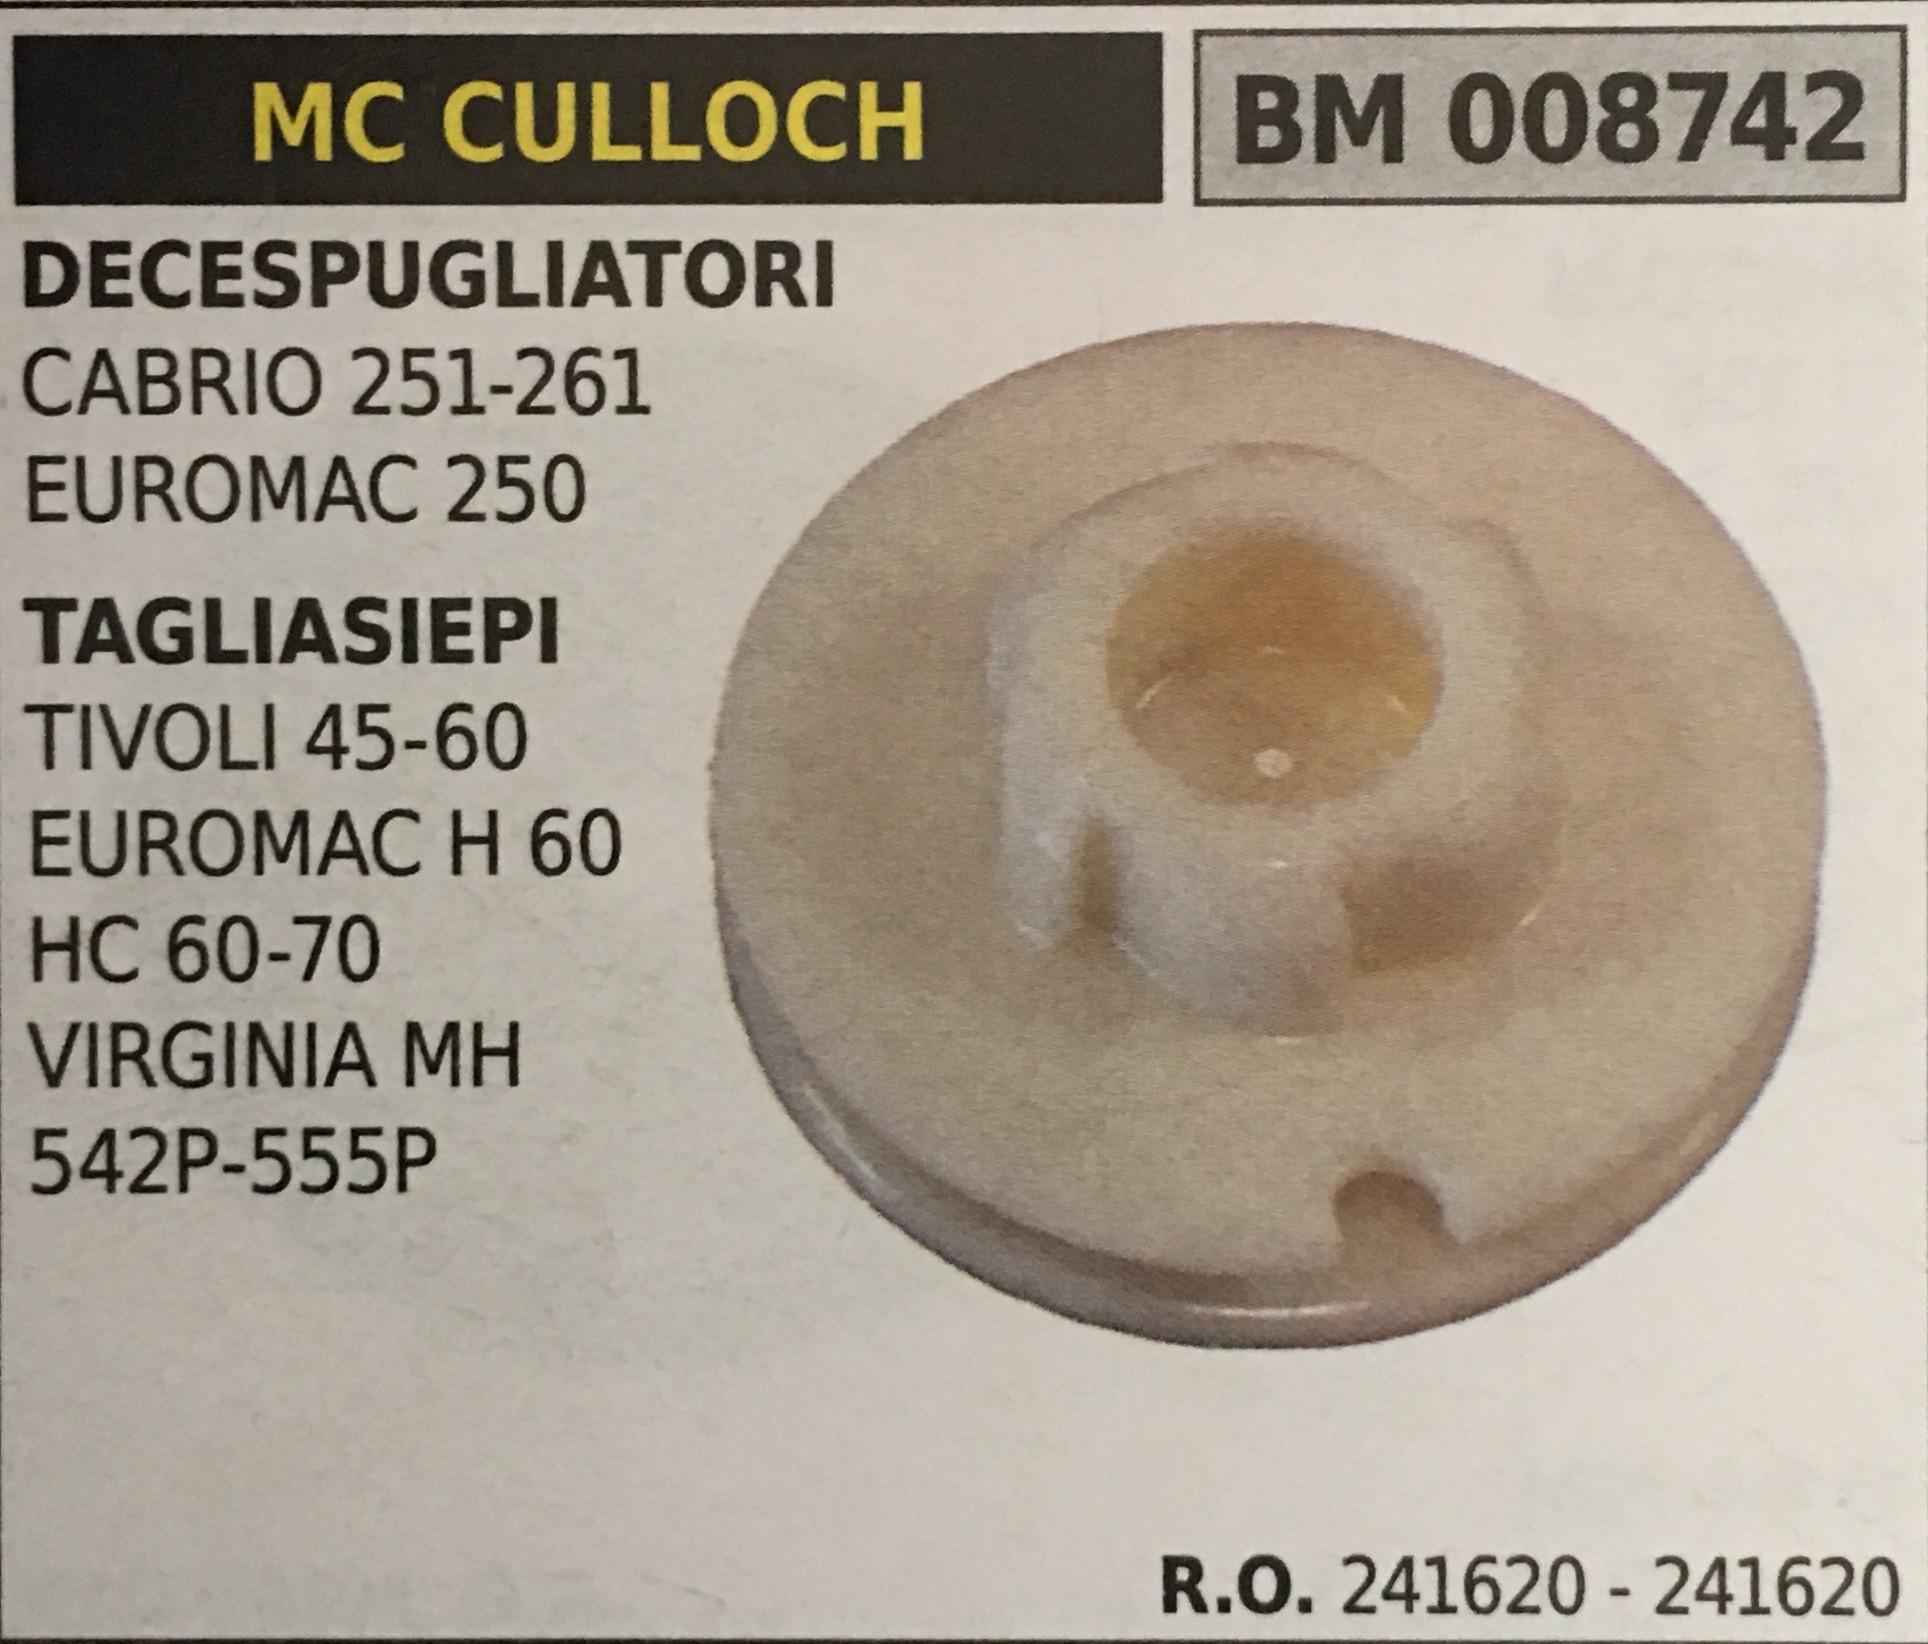 PULEGGIA AVVIAMENTO BRUMAR MC CULLOCH DECESPUGLIATORI CABRIO 251-261 EUROMAC 250 TAGLIASIEPI TIVOLI 45-60 EUROMAC H 60 HC 60-70 VIRGINIA MH 542P-555P